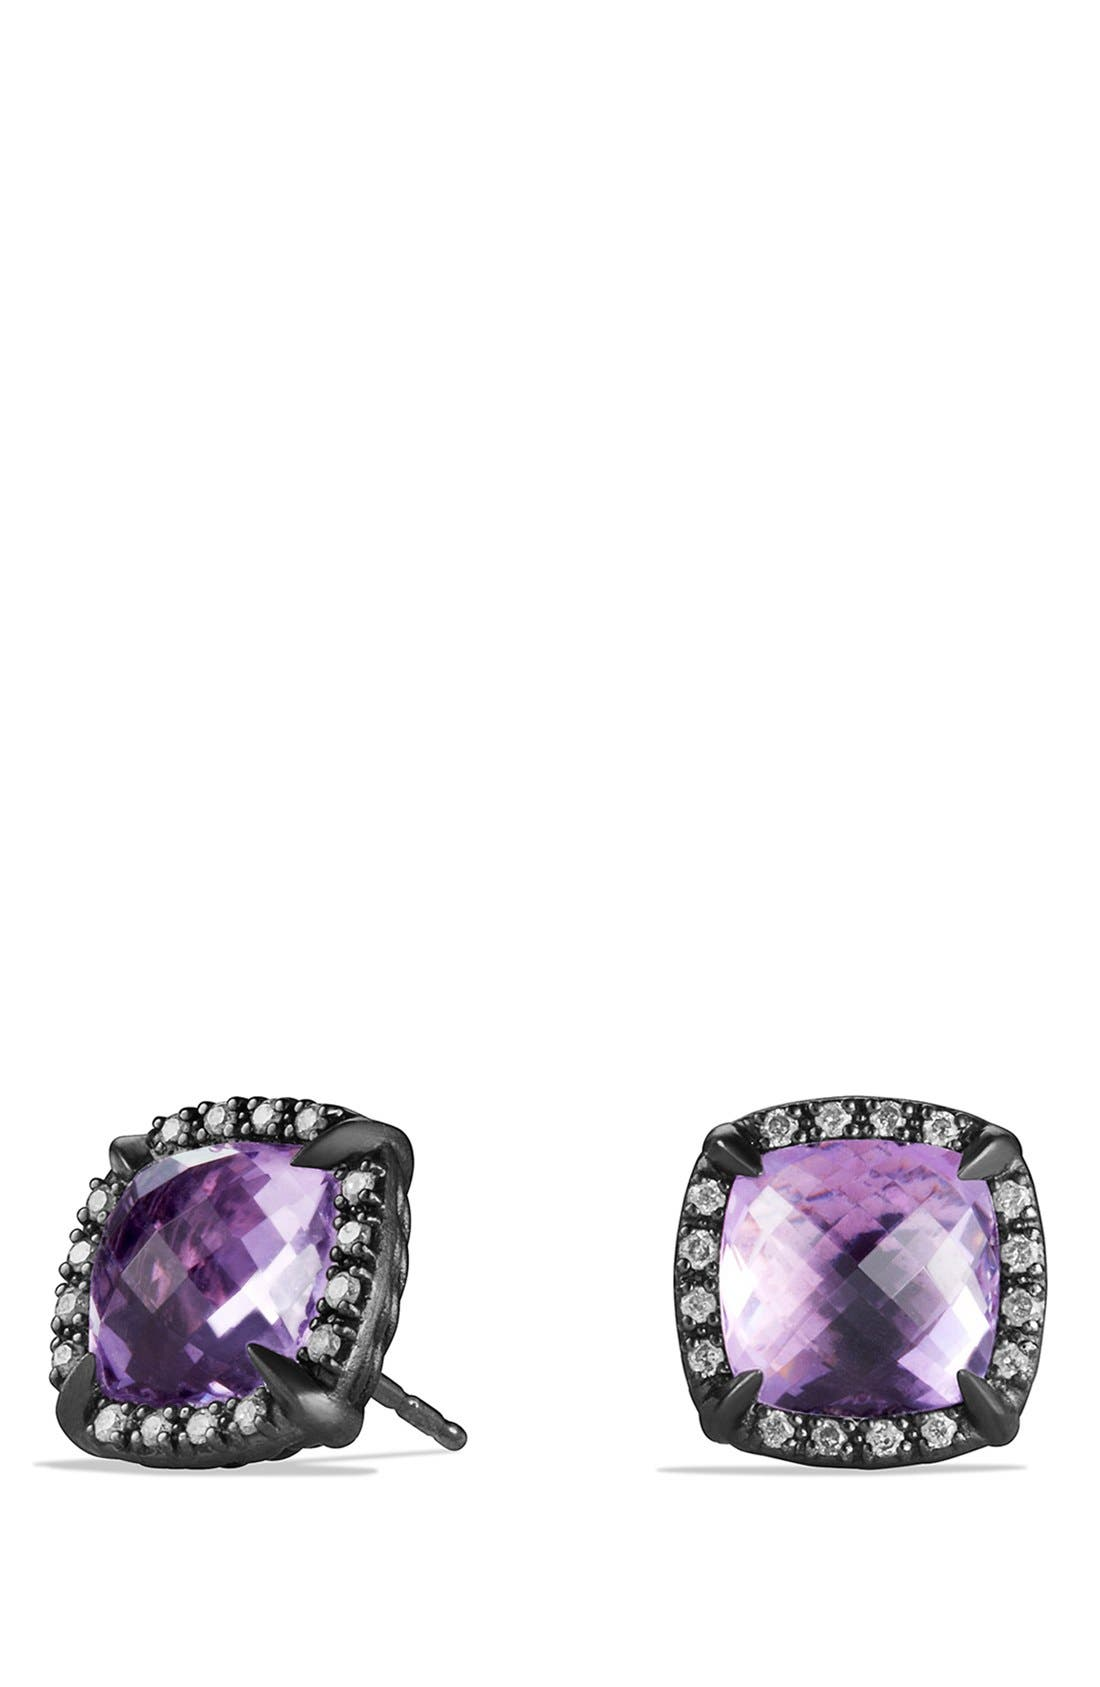 Main Image - David Yurman 'Châtelaine' Earrings with Semiprecious Stone and Diamonds